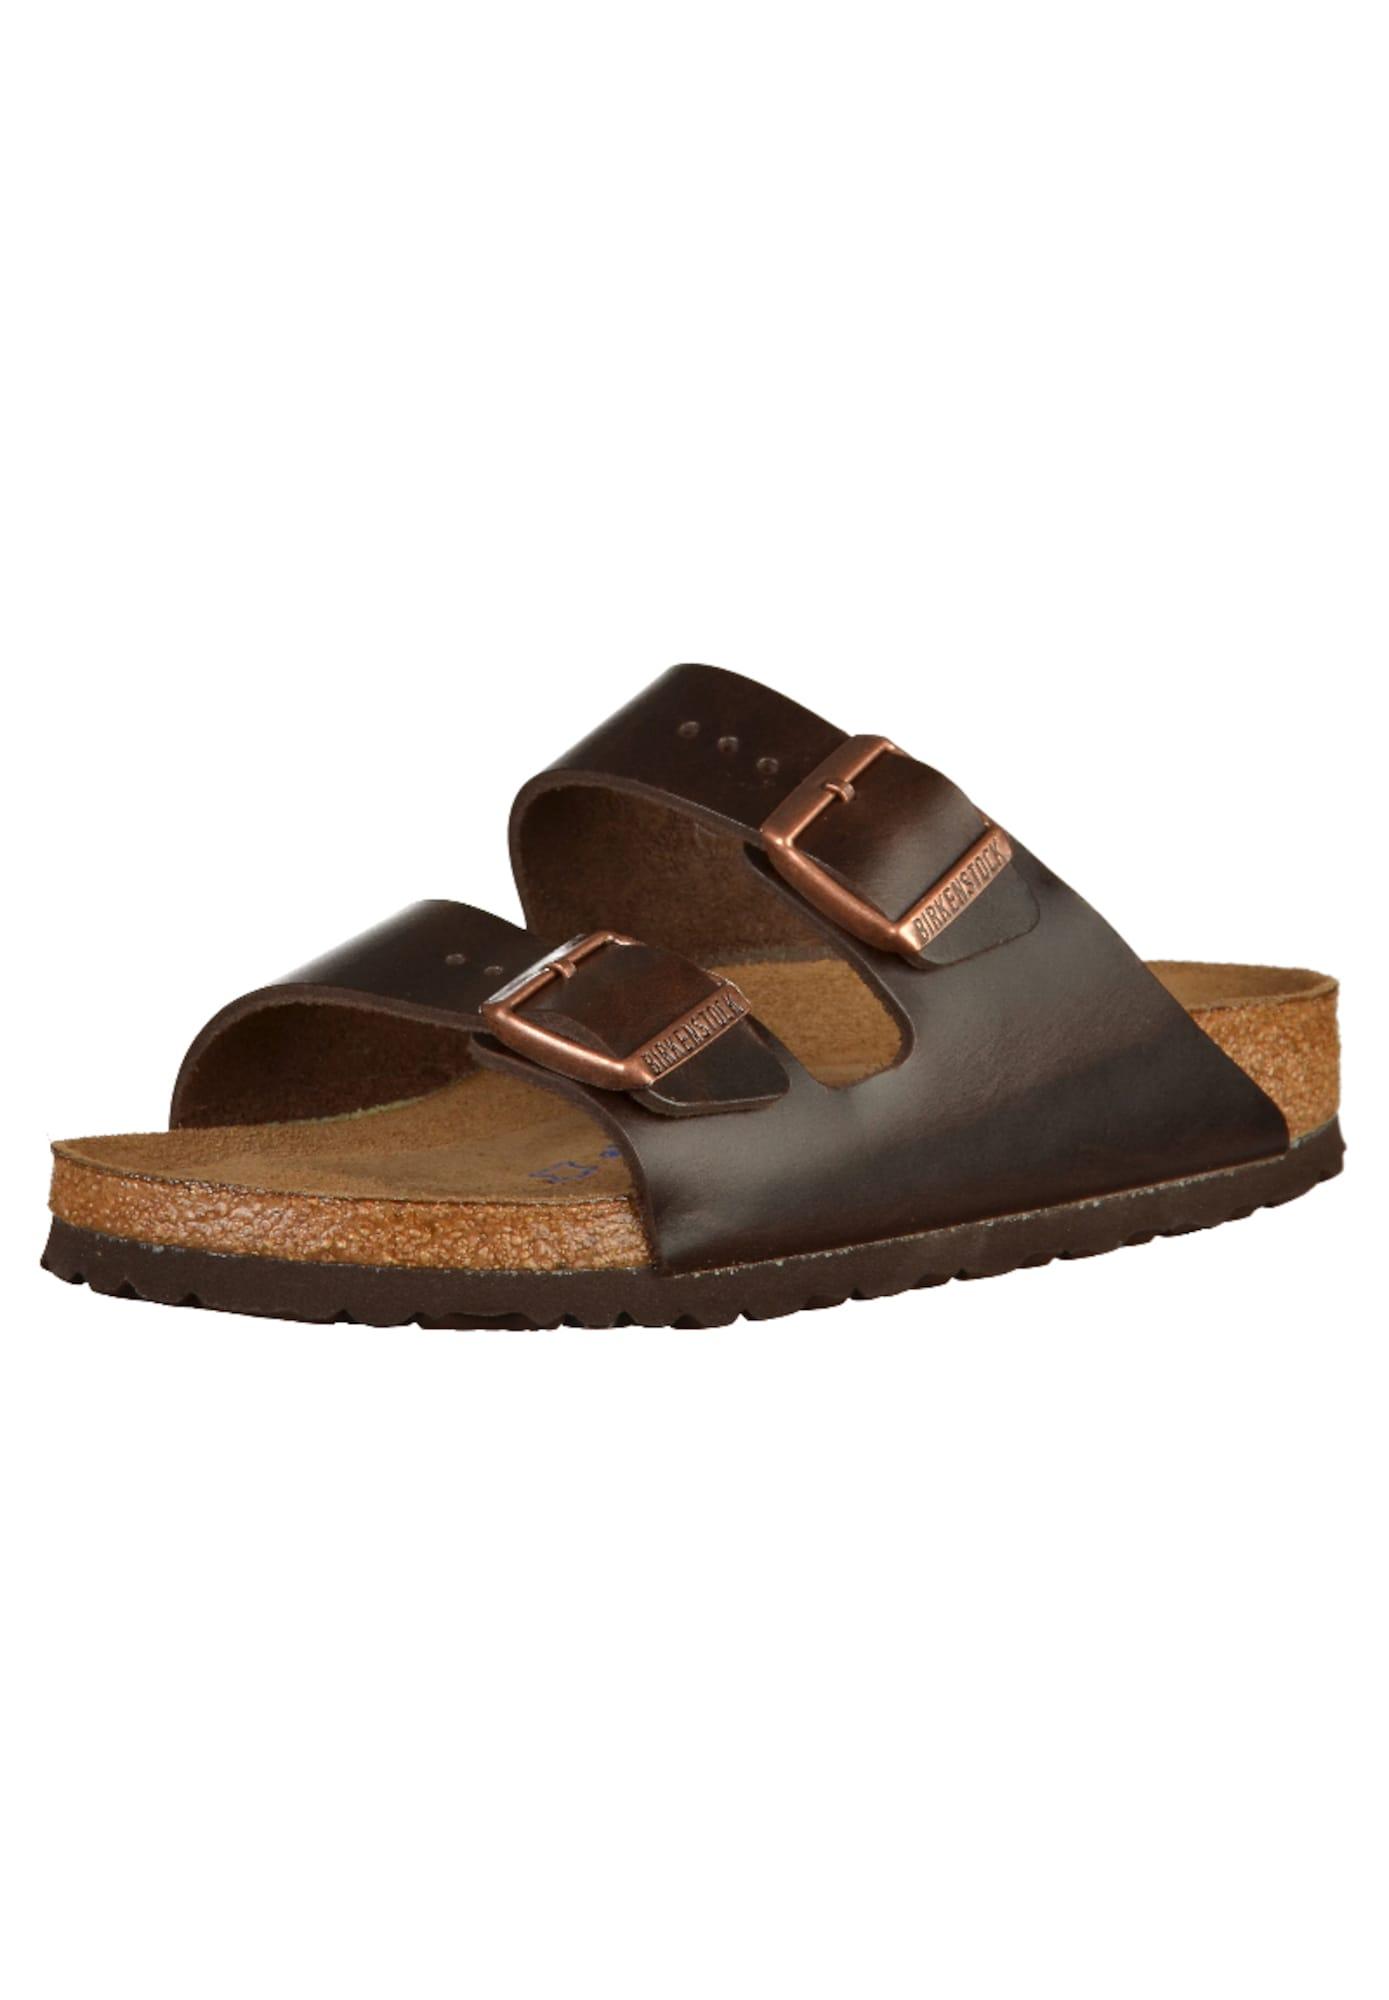 Pantoletten Arizona | Schuhe > Clogs & Pantoletten | Braun | Birkenstock